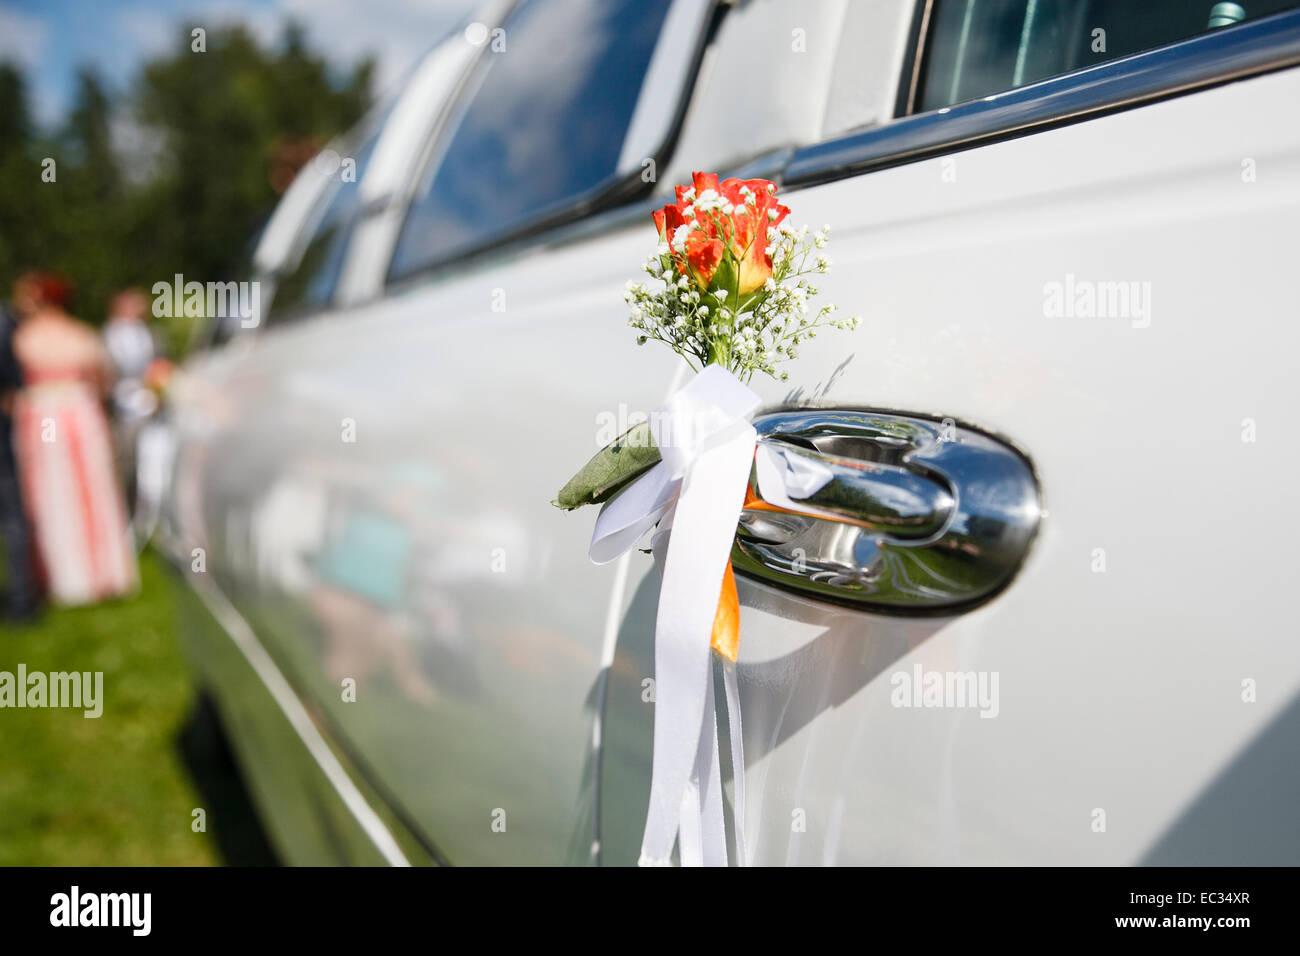 Hochzeitsblumen Am Turgriff Stockfoto Bild 76287087 Alamy